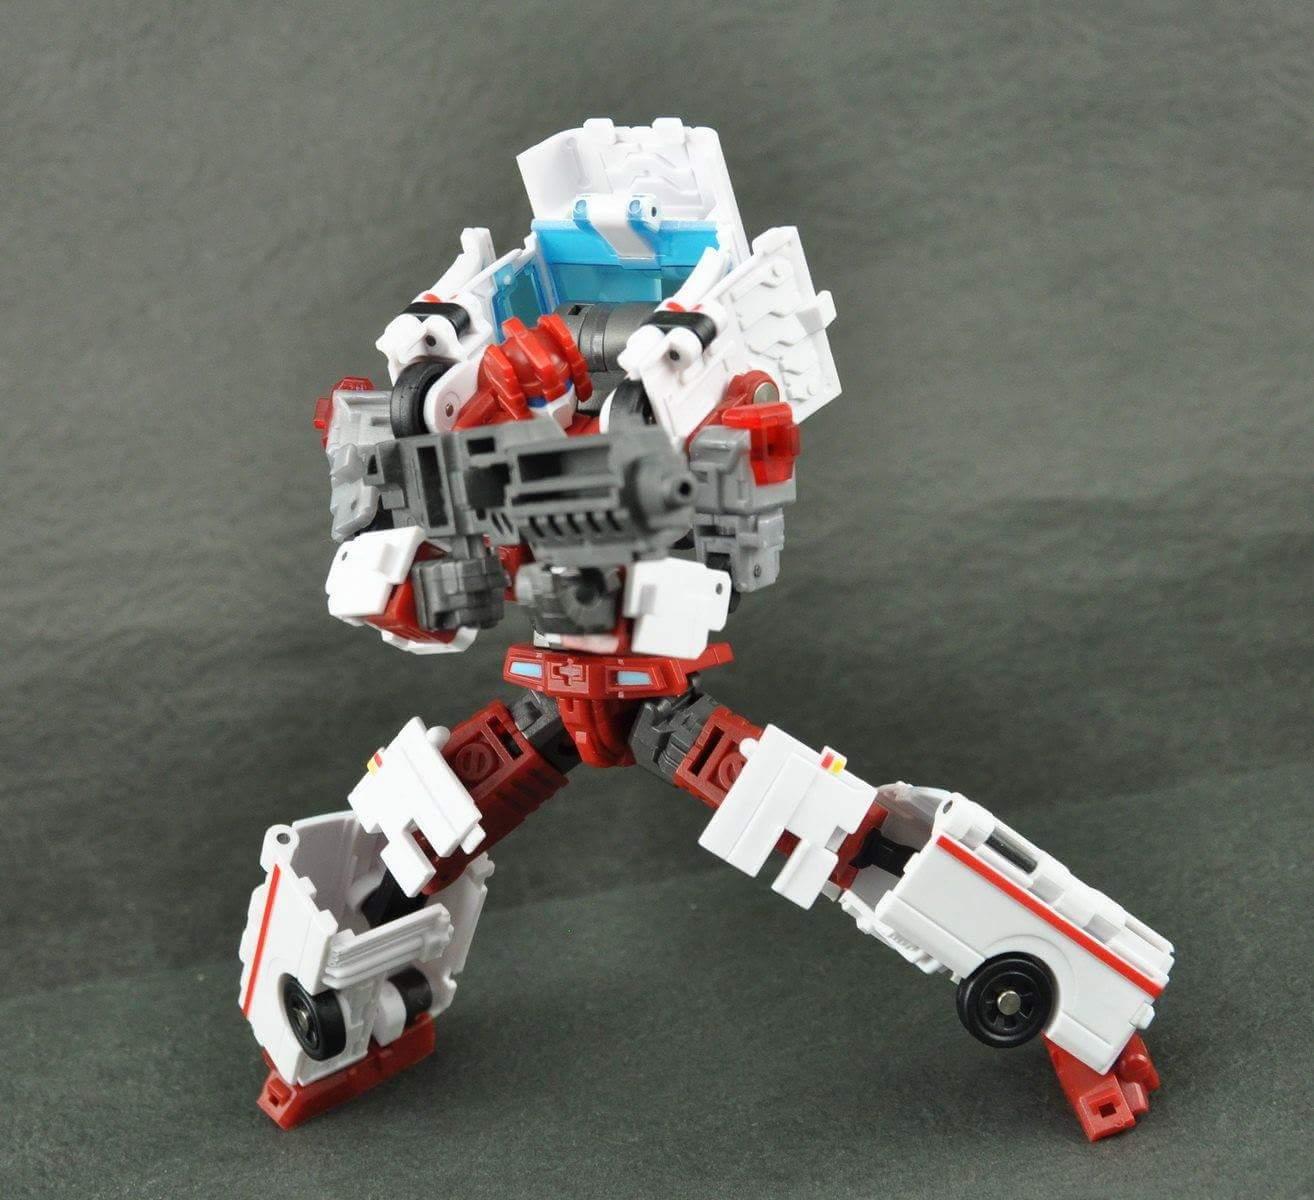 [MakeToys] Produit Tiers - Jouet MTCM-04 Guardia (aka Protectobots - Defensor/Defenso) - Page 3 Y3qUnAdP